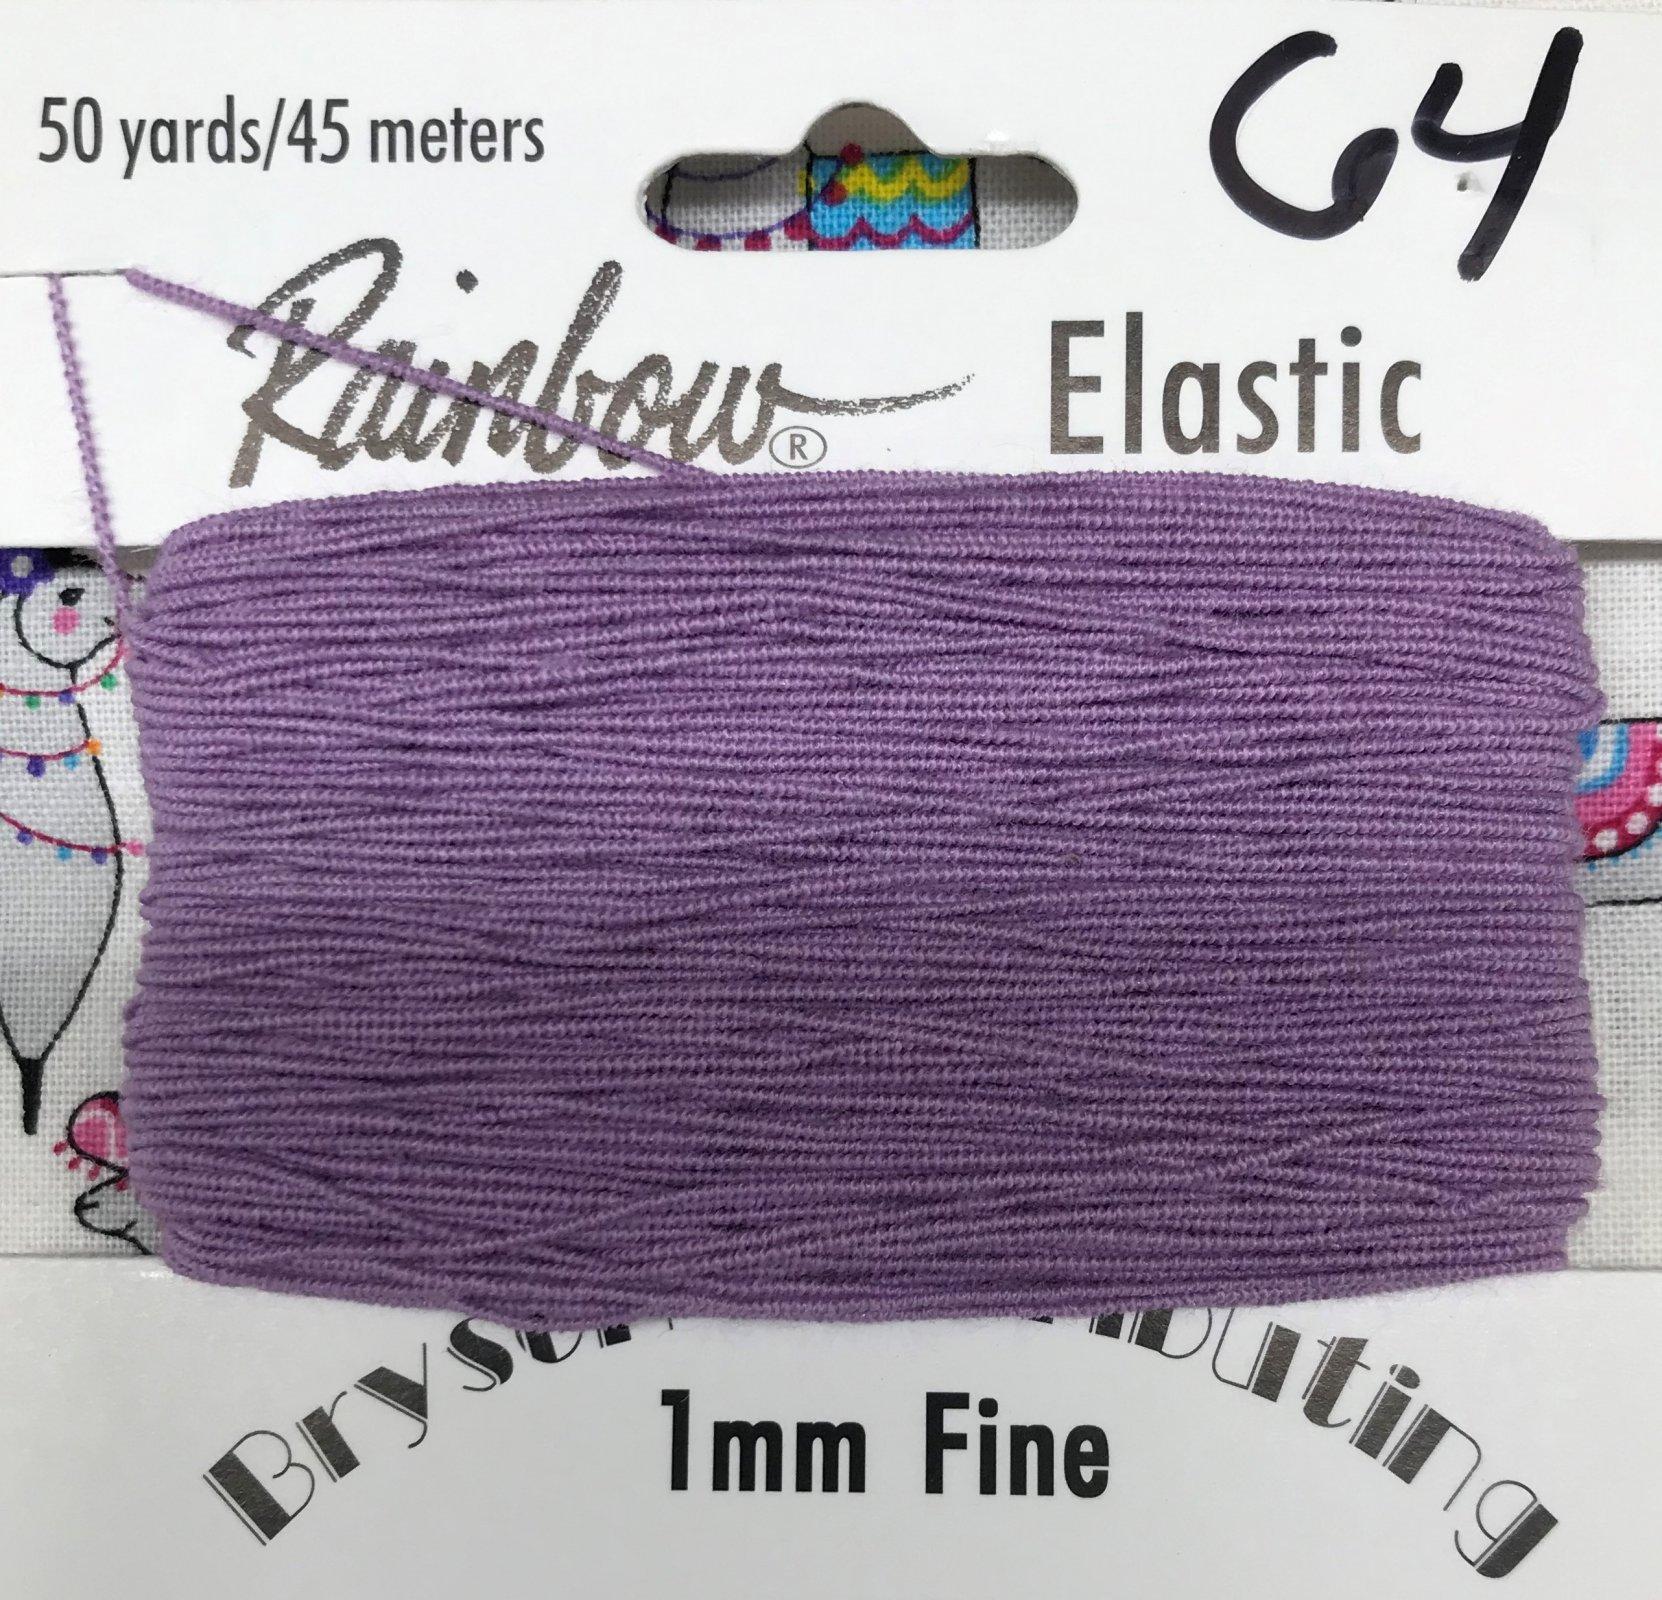 Violet, 1mm Fine-50y Elastic